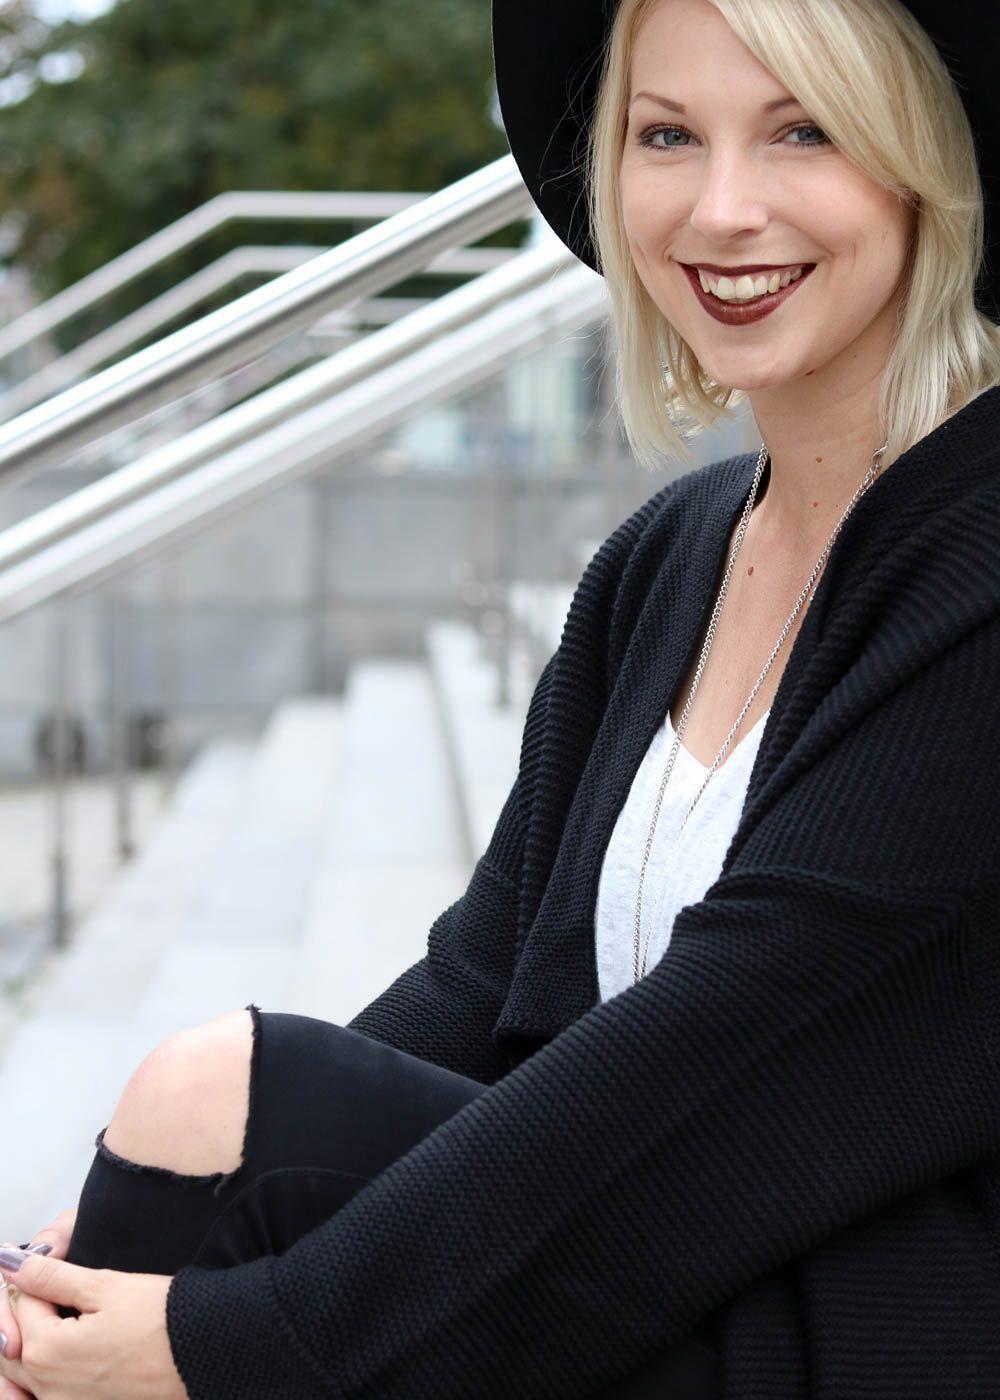 fashionblogger-mannheim-outfit-longcardigan-nike-air-max-skinnyjeans-rucksack-18-von-20